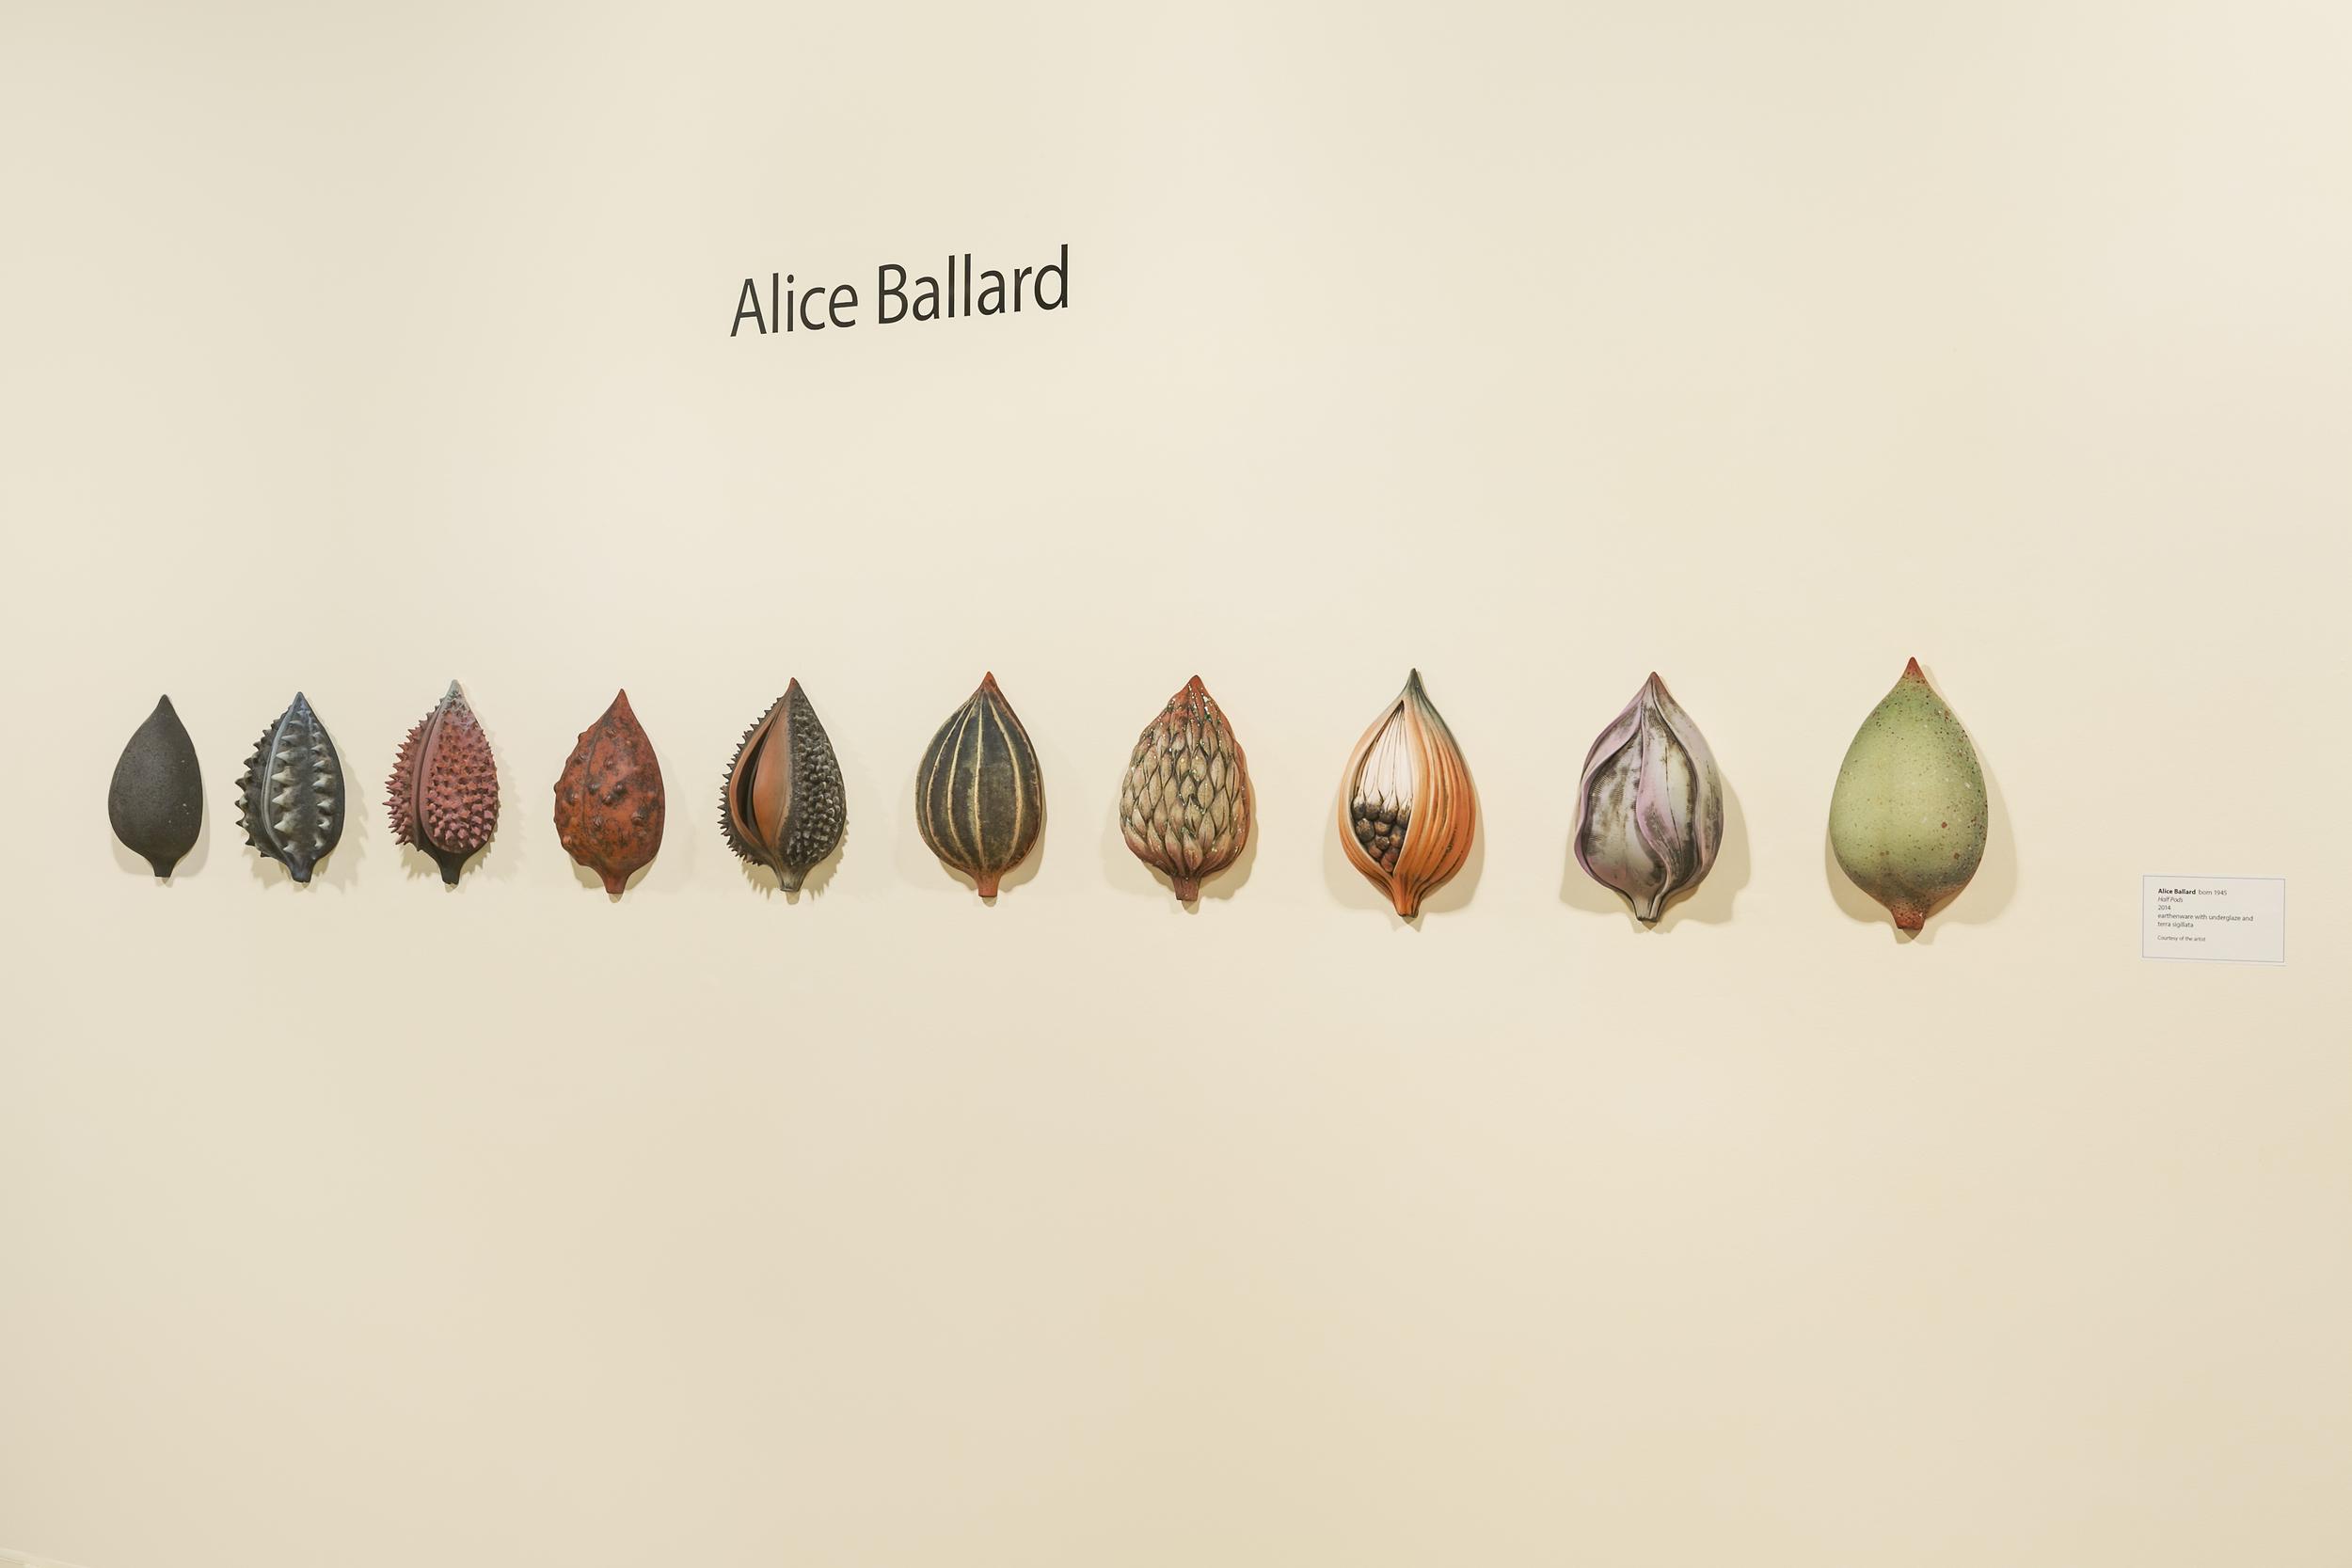 10 Half-Pods, an installation at the GCMA, Alice Ballard's solo show georgeleephotography.com